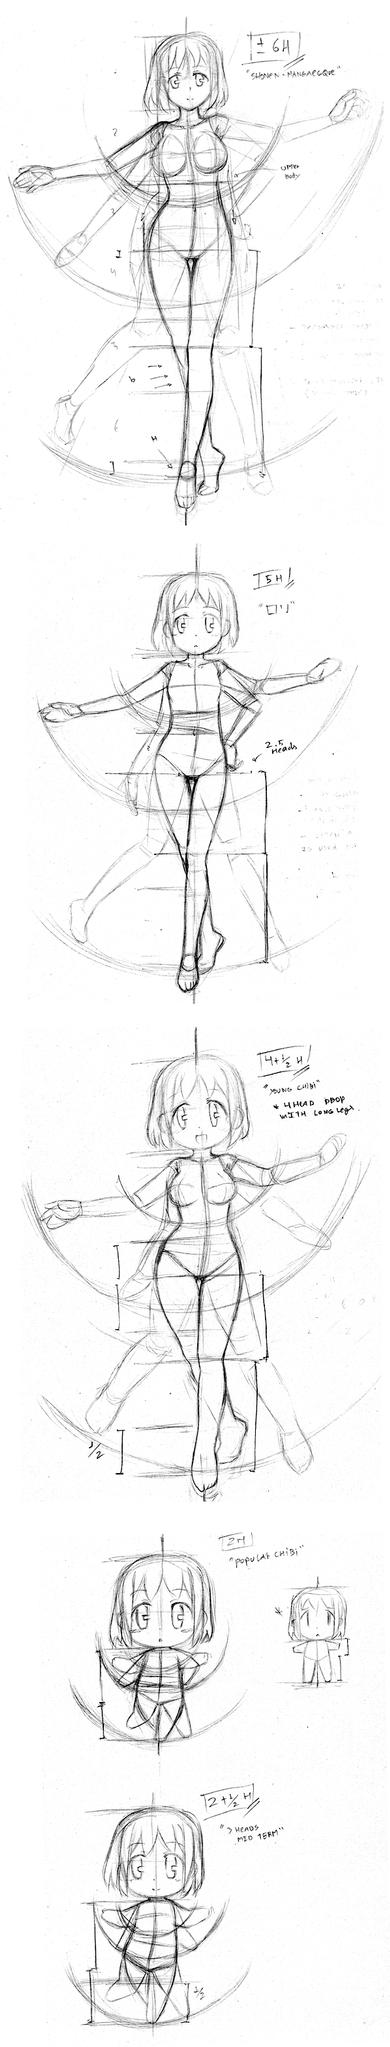 Junk Sketch 60 by CatPlus